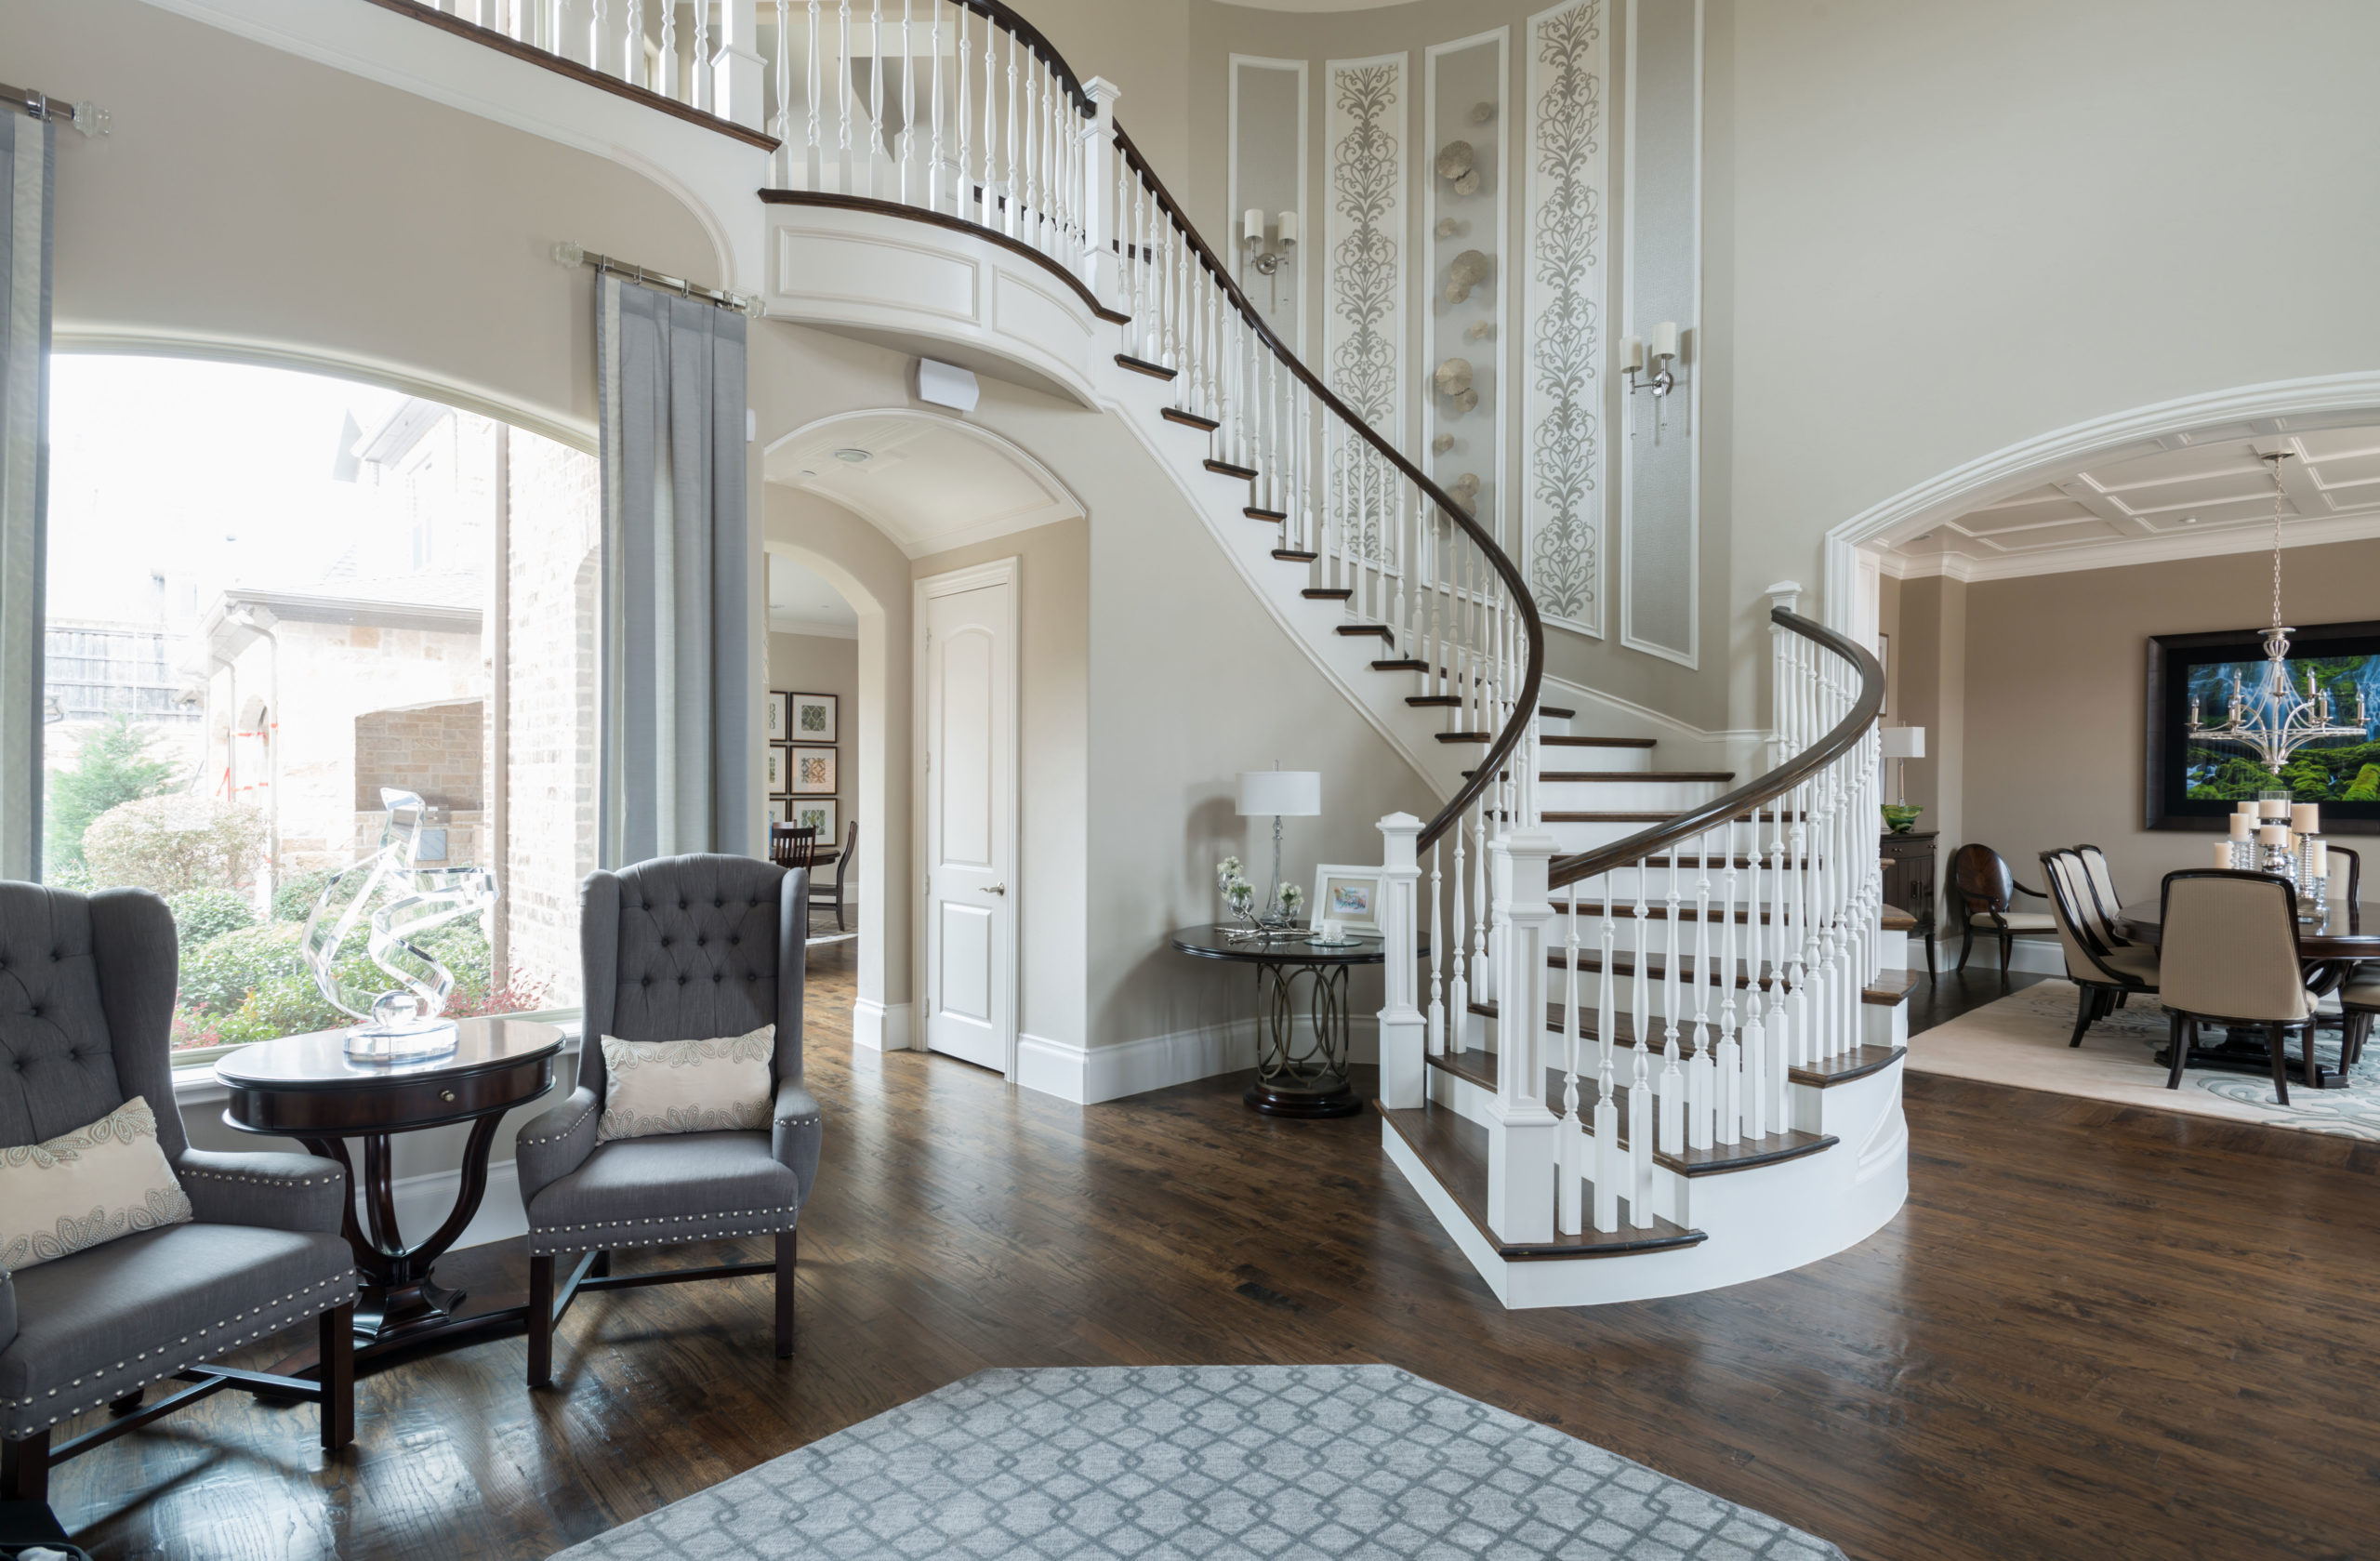 Calm Serenity 1 - Dallas Interior Designer serving Plano, Frisco, Dallas, Allen for Decorating Den Interiors D'KOR HOME by Dee Frazier Interiors